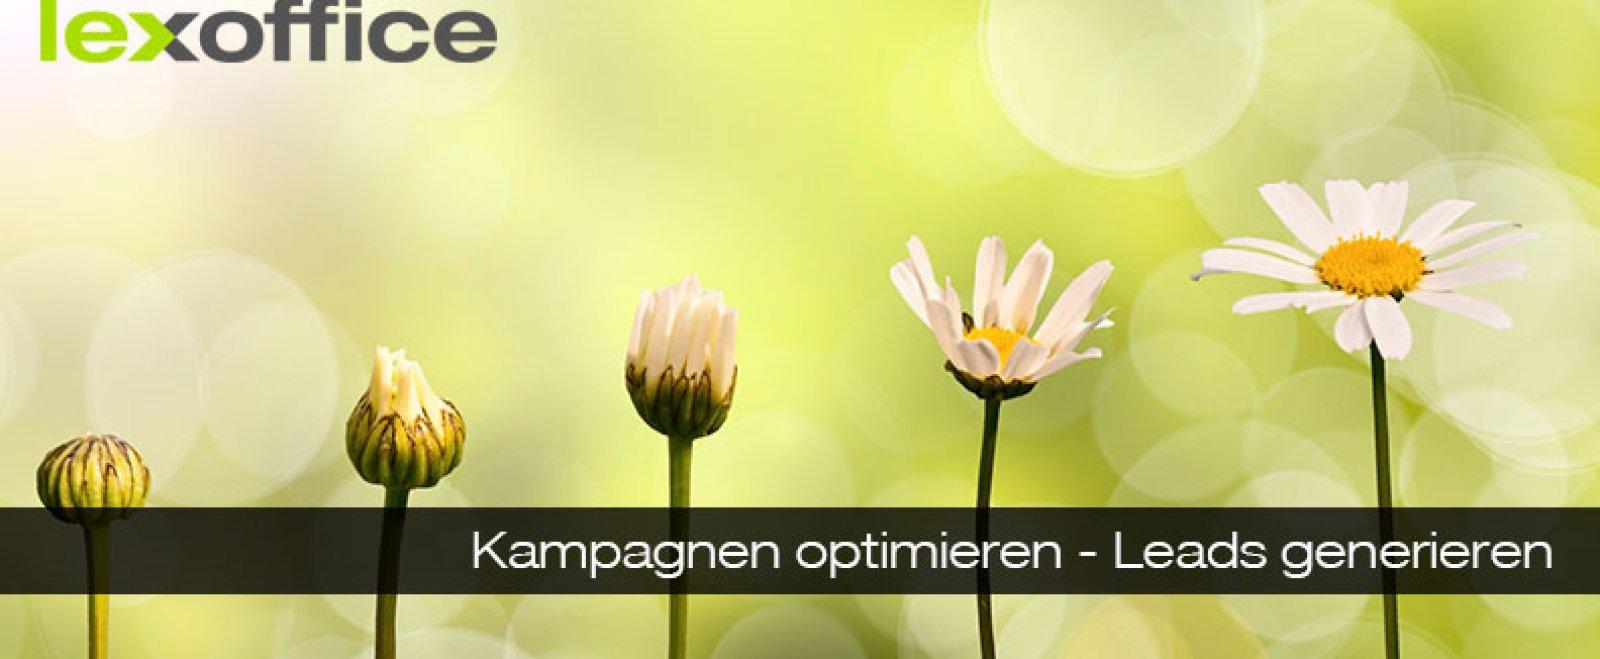 Online-Marketing: Kampagnen optimieren - Leads generieren